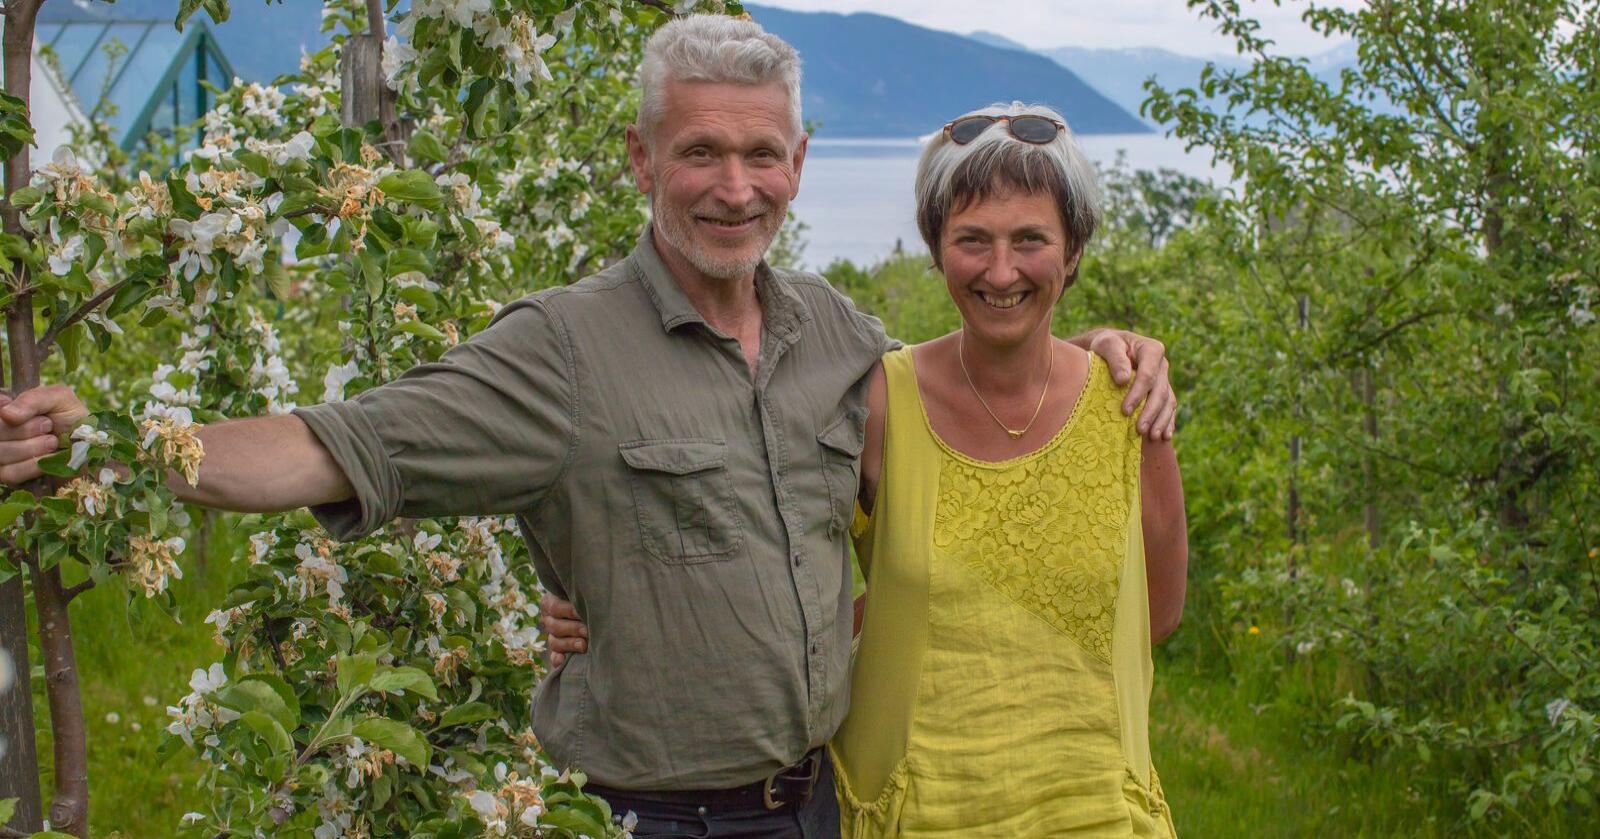 Åge Eitungjerde og Eli-Grete Høyvik i Balholm har hatt rekordstor vekst under pandemien. Foto: Eivind Takserud